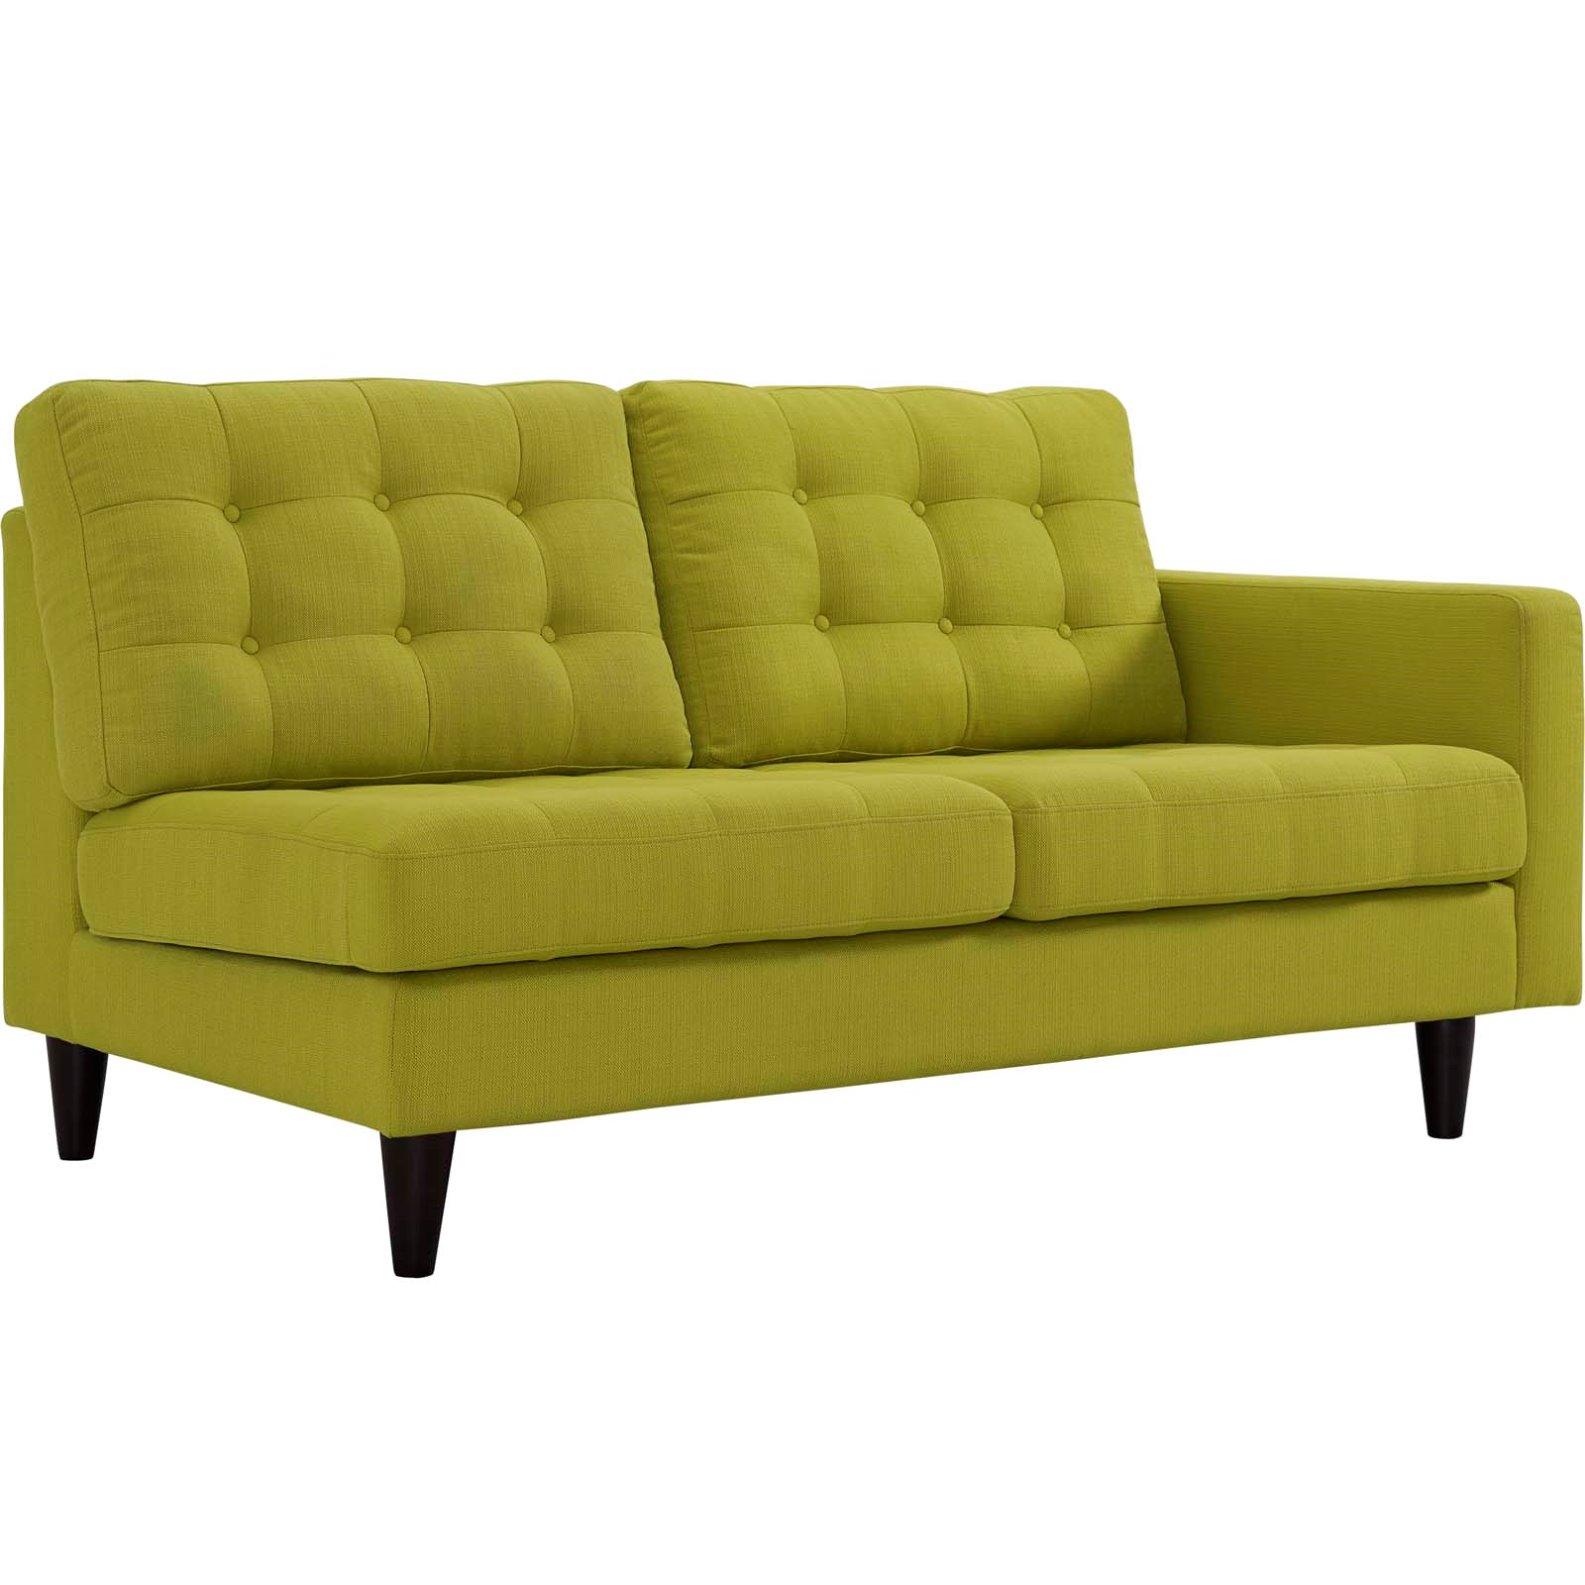 Modern Contemporary Urban Design Living Lounge Room Right-Facing Loveseat Sofa, Green, Fabric